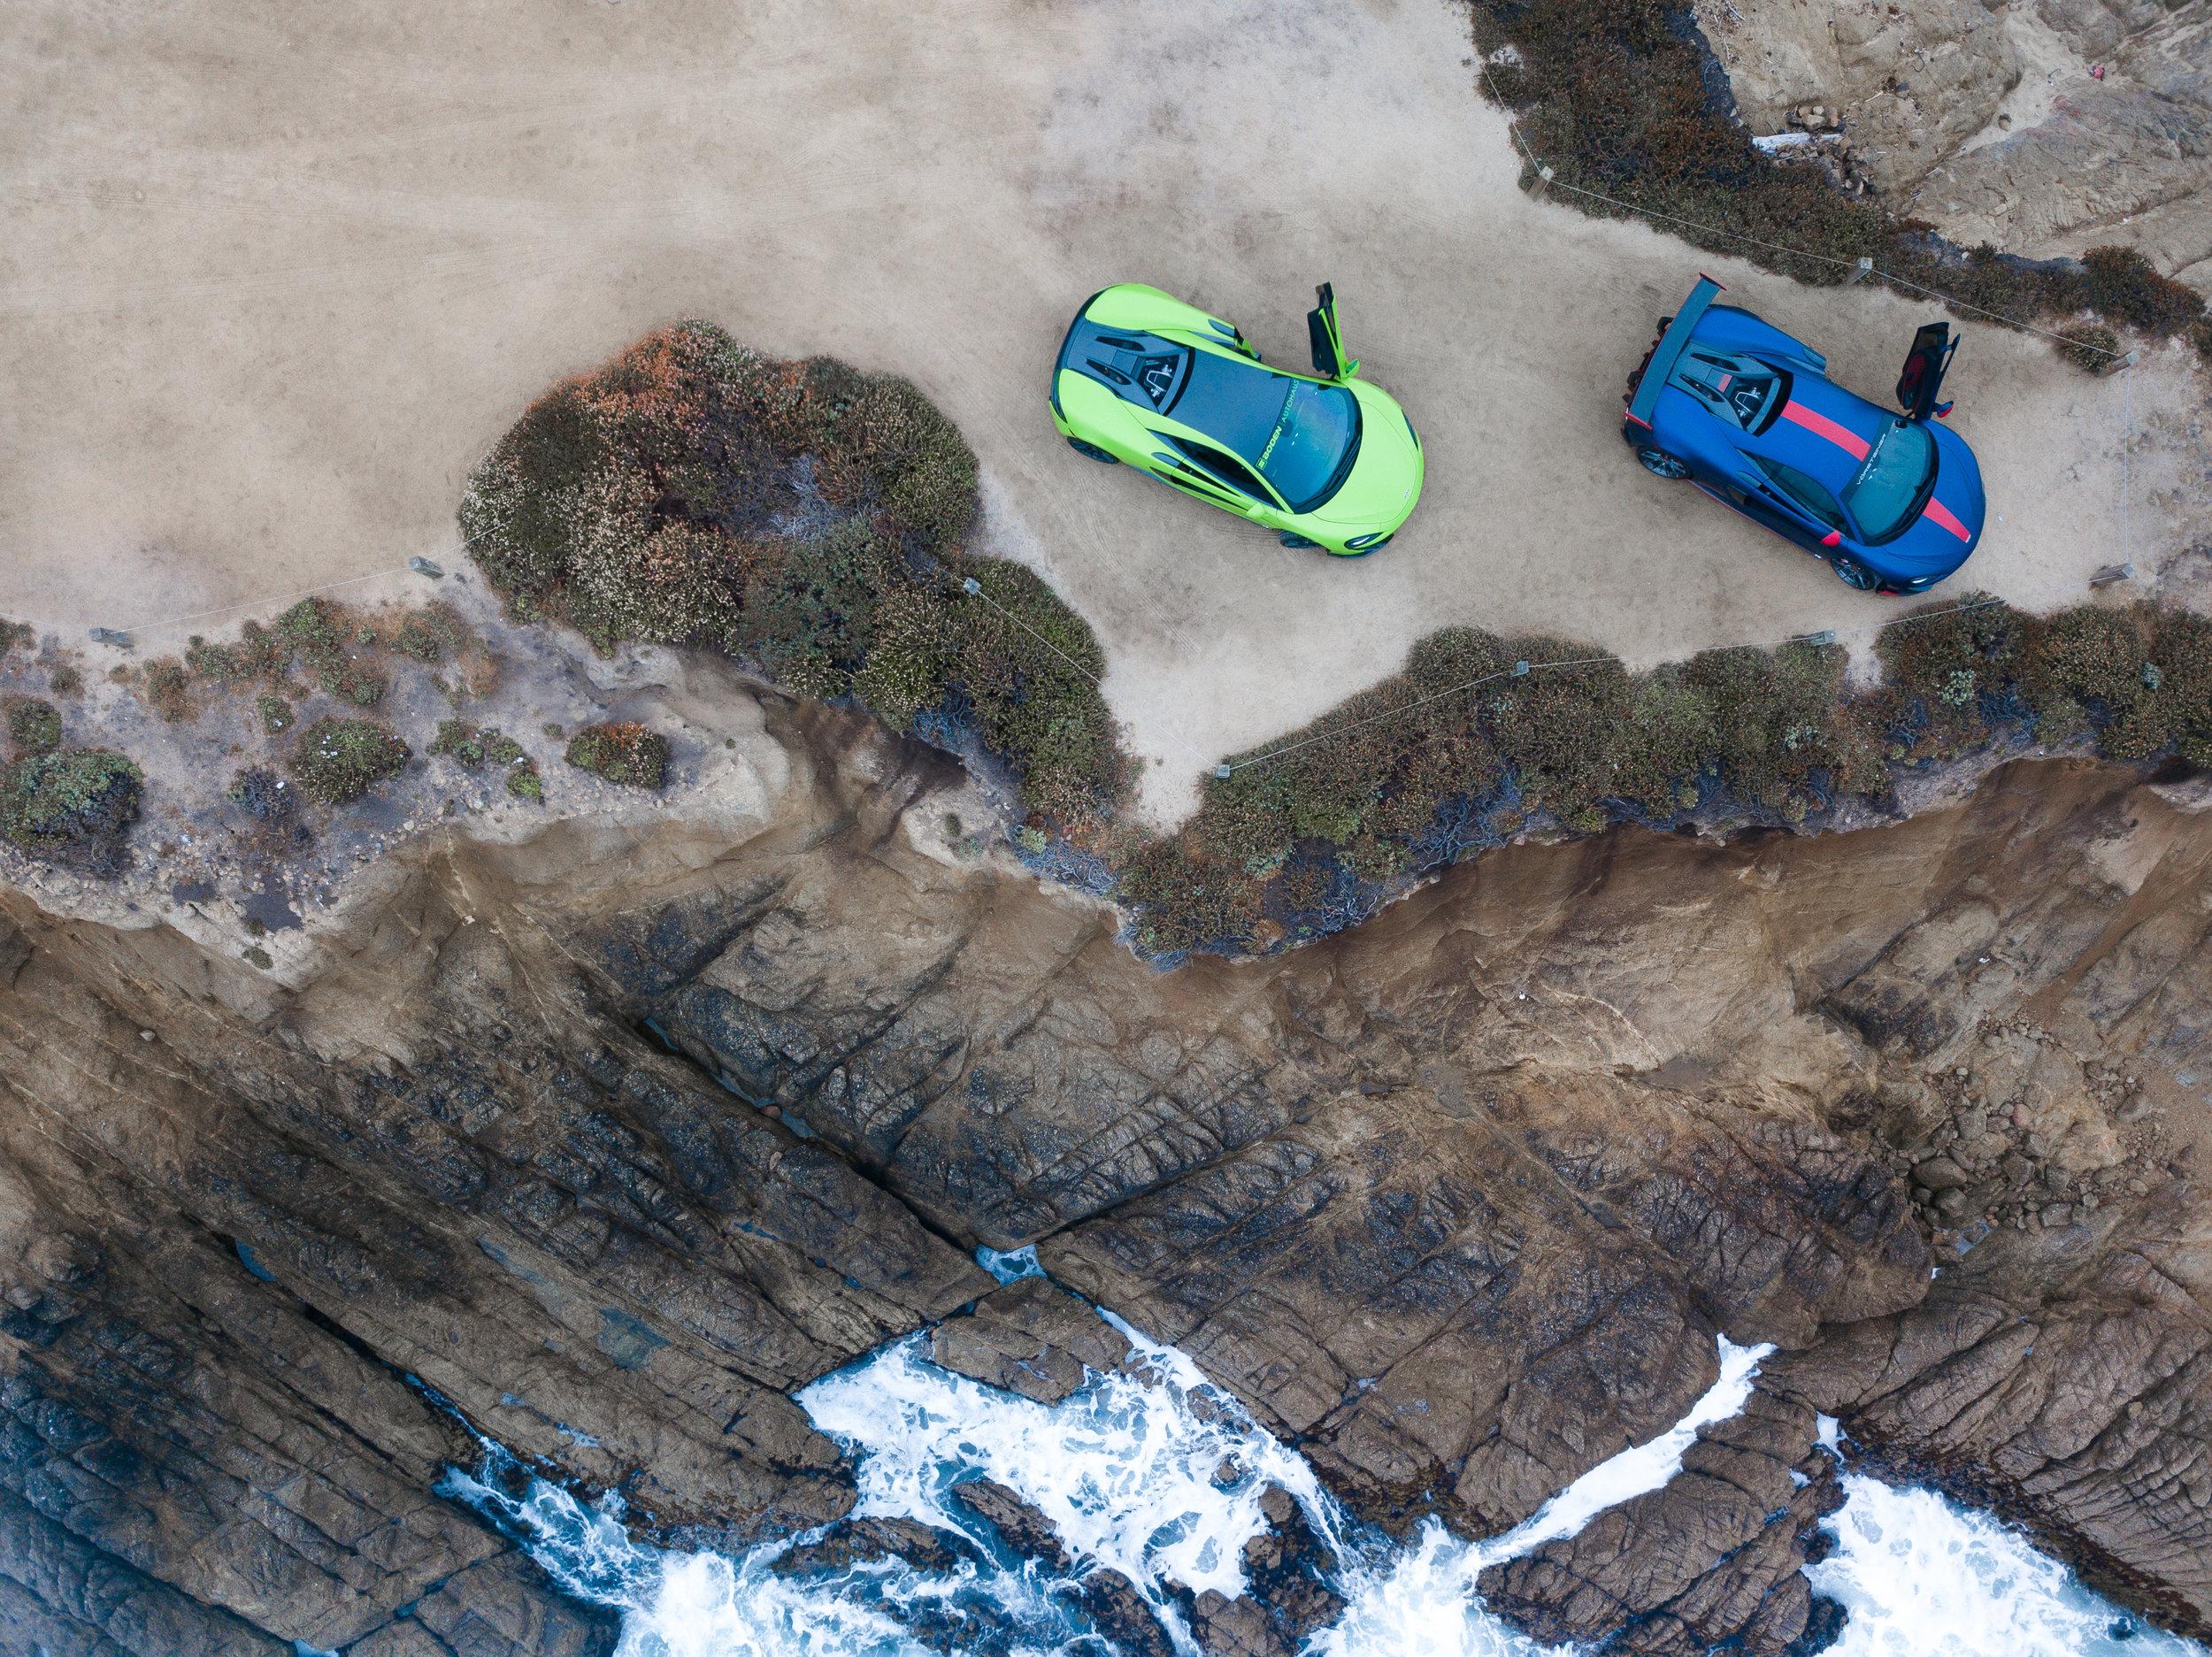 Stay_Driven_Monterey_Mclarens_DRONE-26.jpg